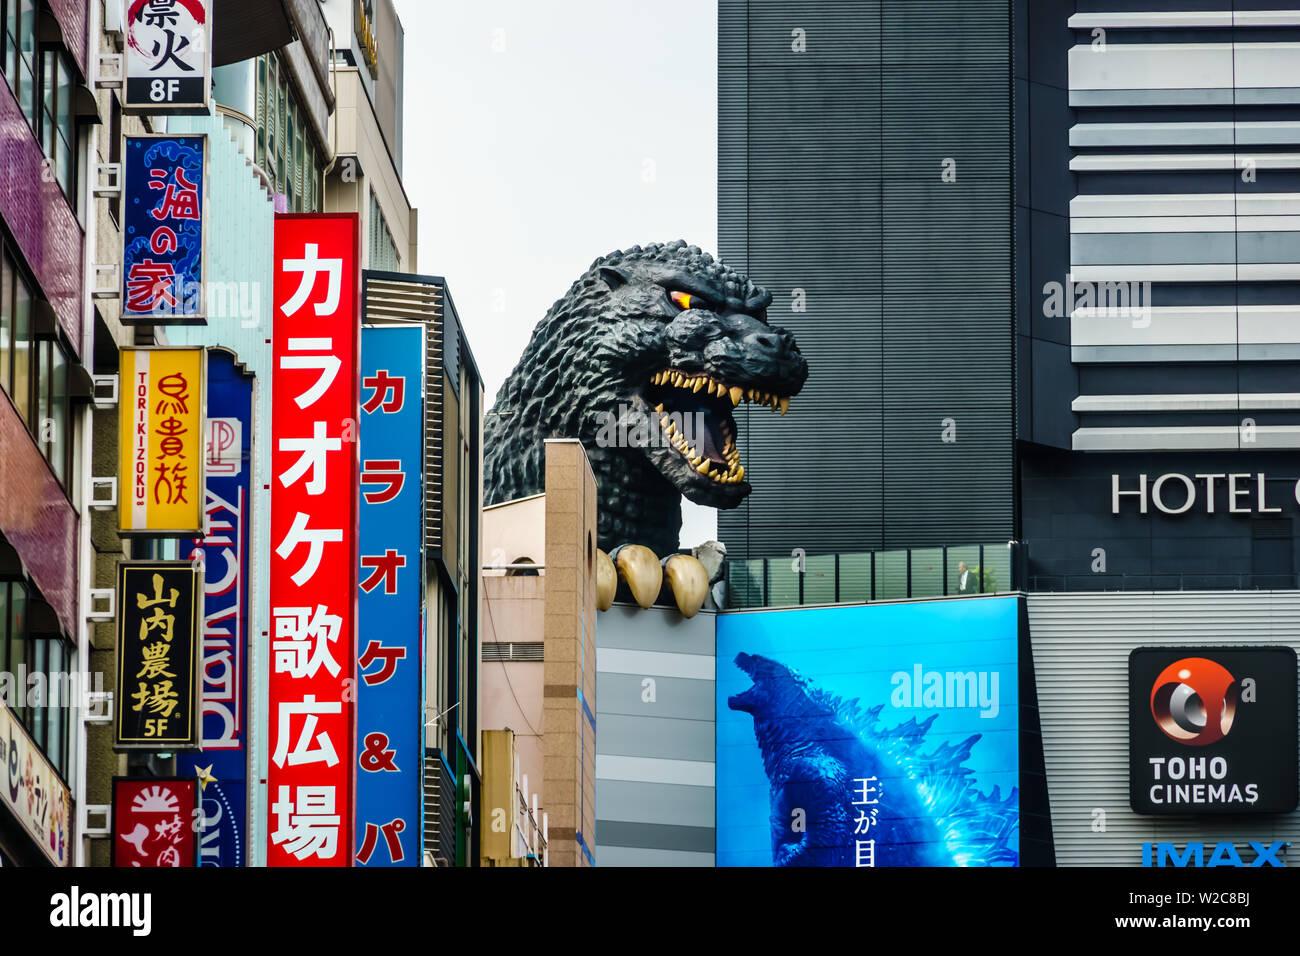 Tokyo, Japan - May 10, 2019: At Godzilla's hometown of Tokyo, a giant Godzilla Head of the scaly menace is towering over the Toho Building in Shinjuku. - Stock Image